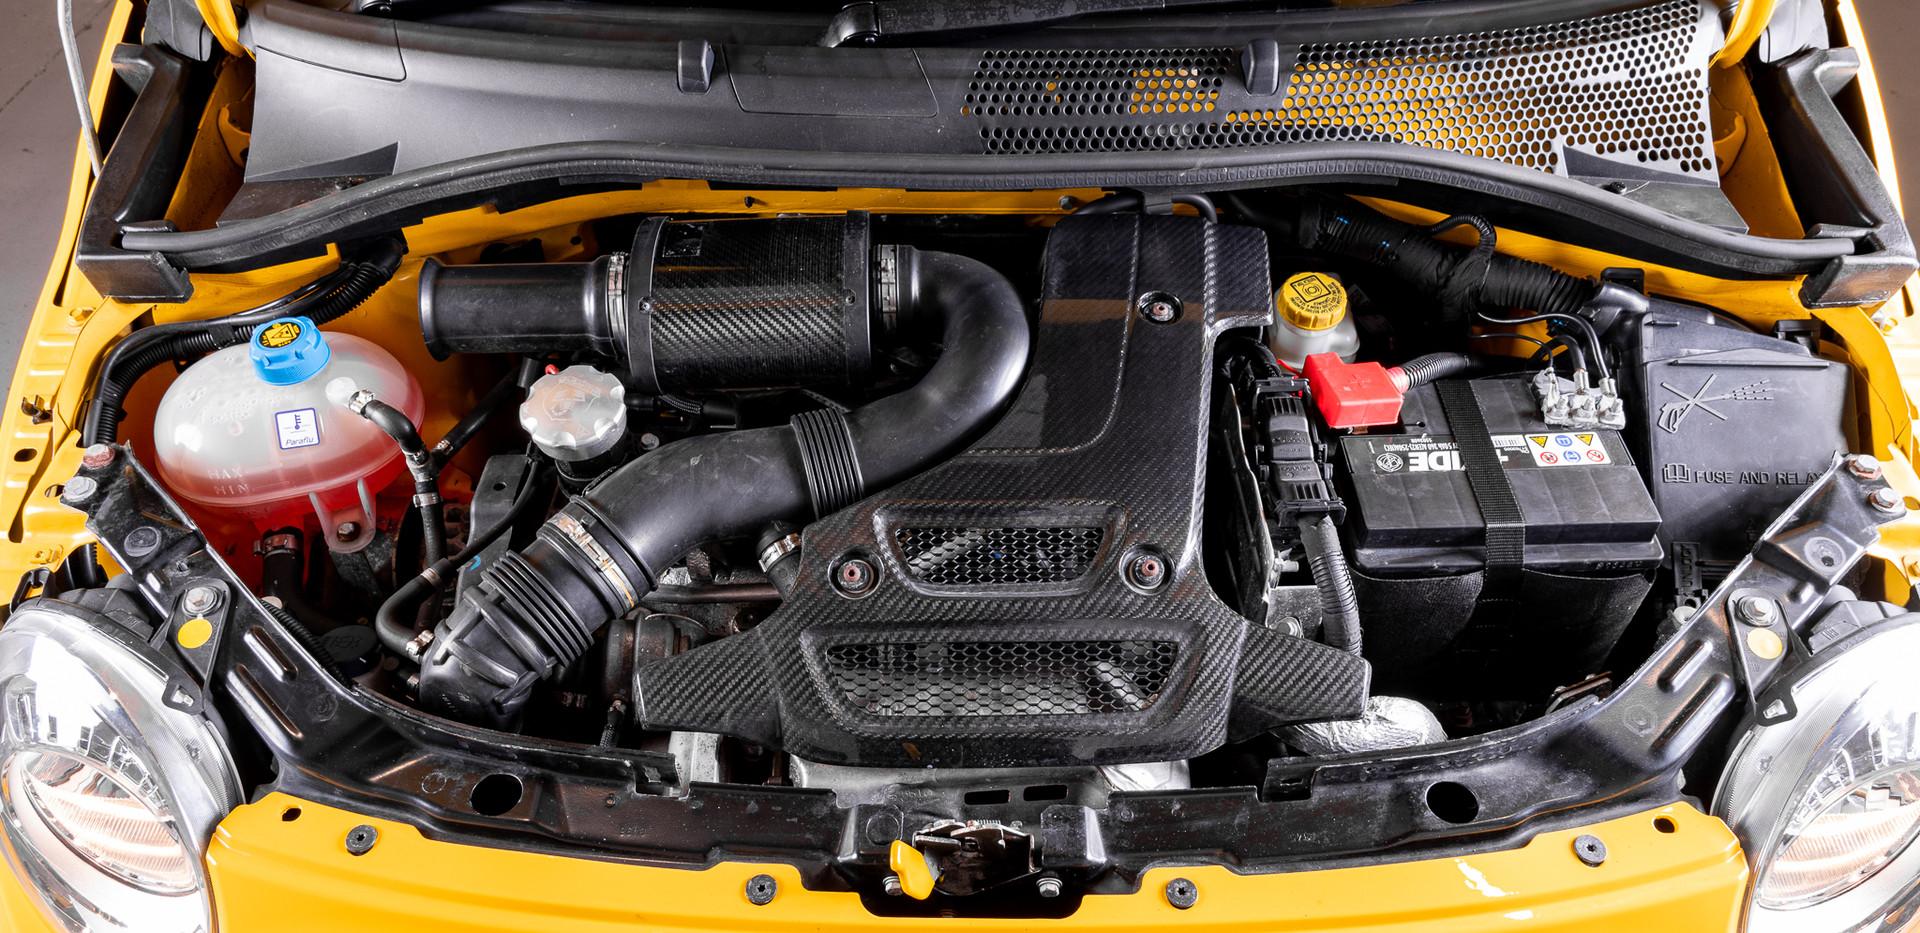 Fiat 500 695 Abarth Biposto (70).jpg